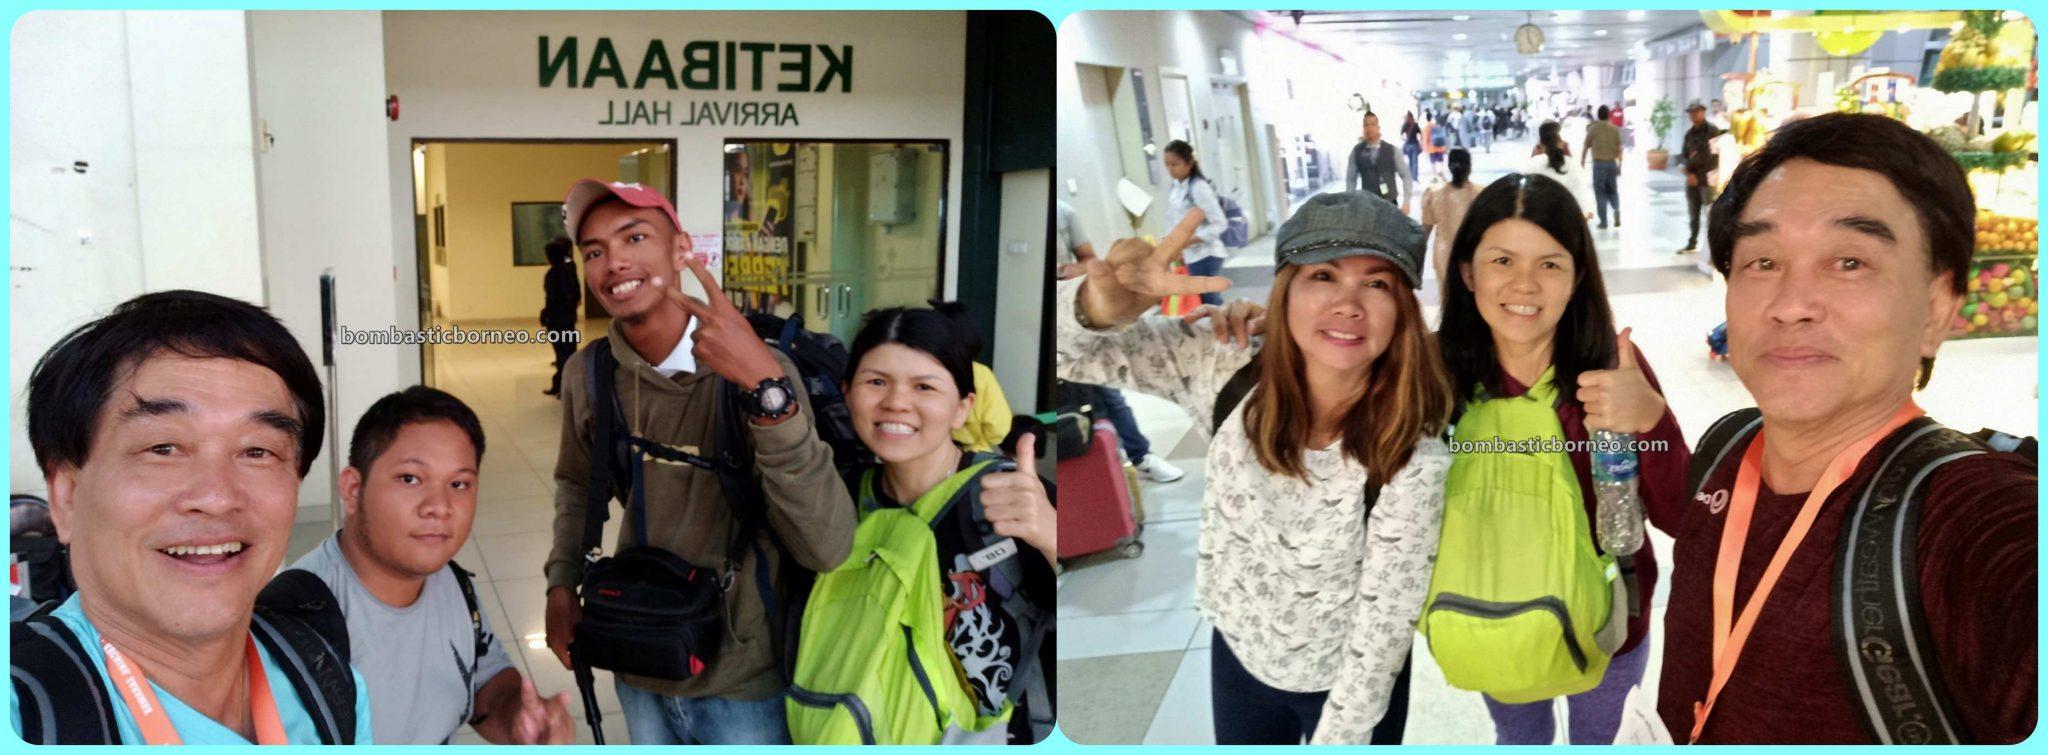 wonderful Indonesia, Familiarisation Trip Kaltara, express boat, Boat ride, transportation, Tawau, backpackers, exploration,Tourism, travel guide, cross border, trans border, 探索婆罗洲游踪,